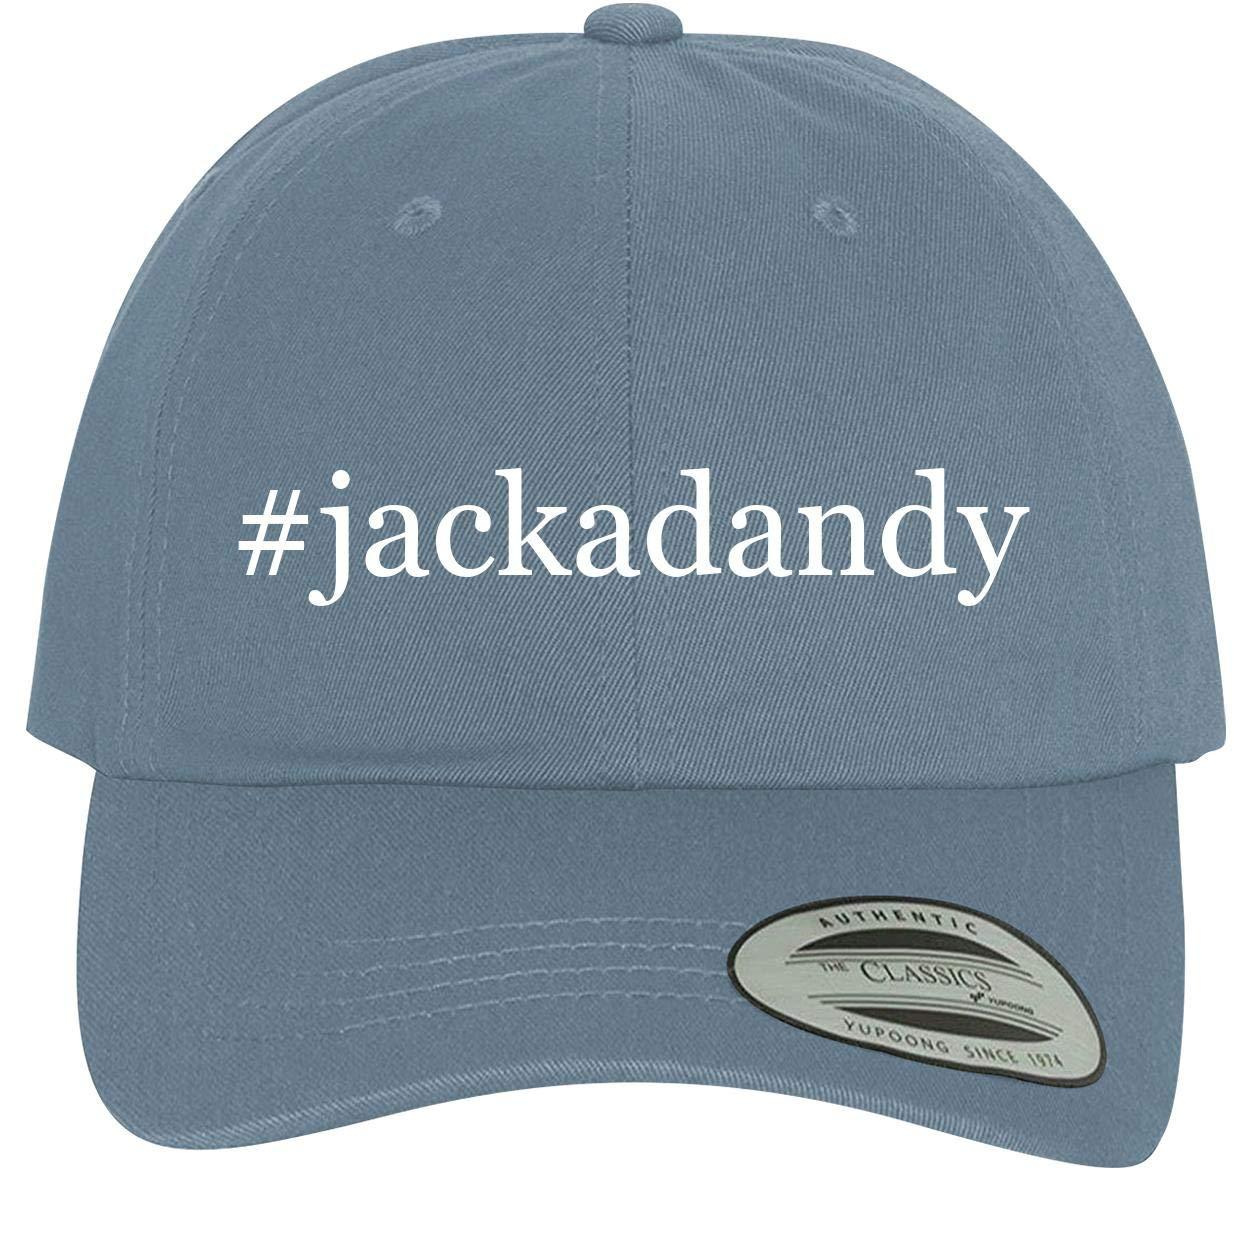 BH Cool Designs #jackadandy Comfortable Dad Hat Baseball Cap